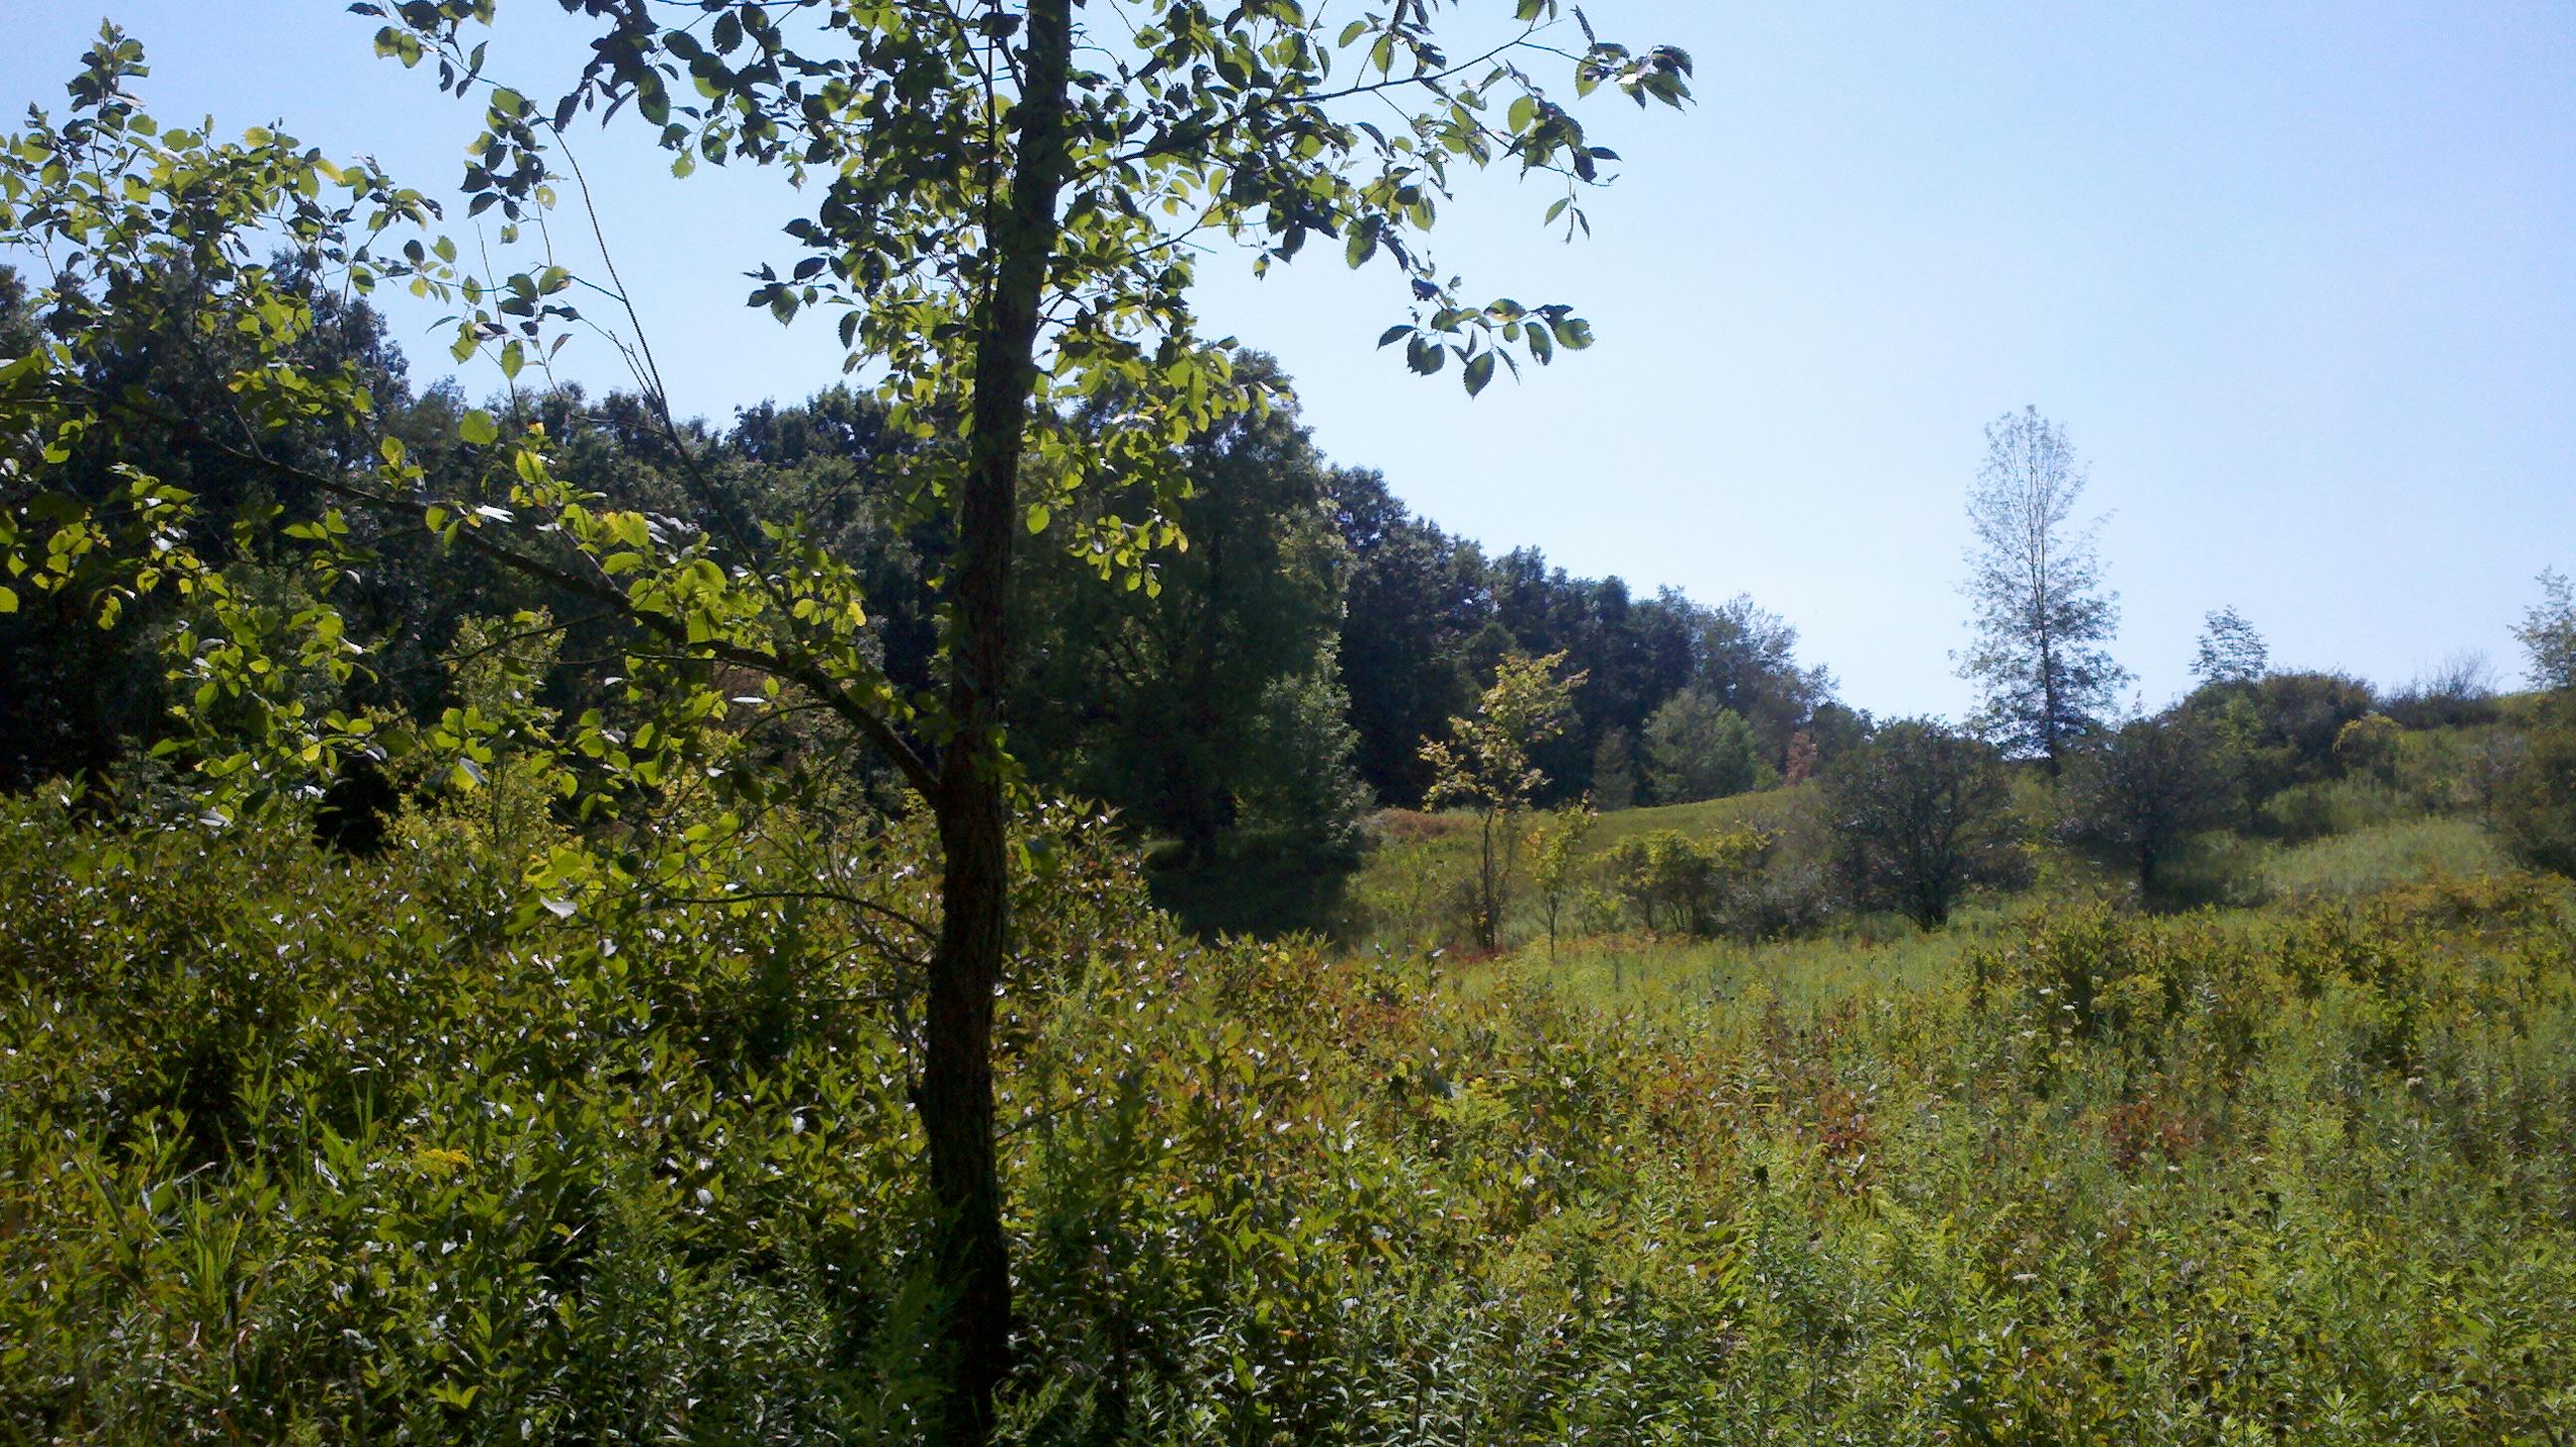 Ridgeline 1 at Sleepy Hollow